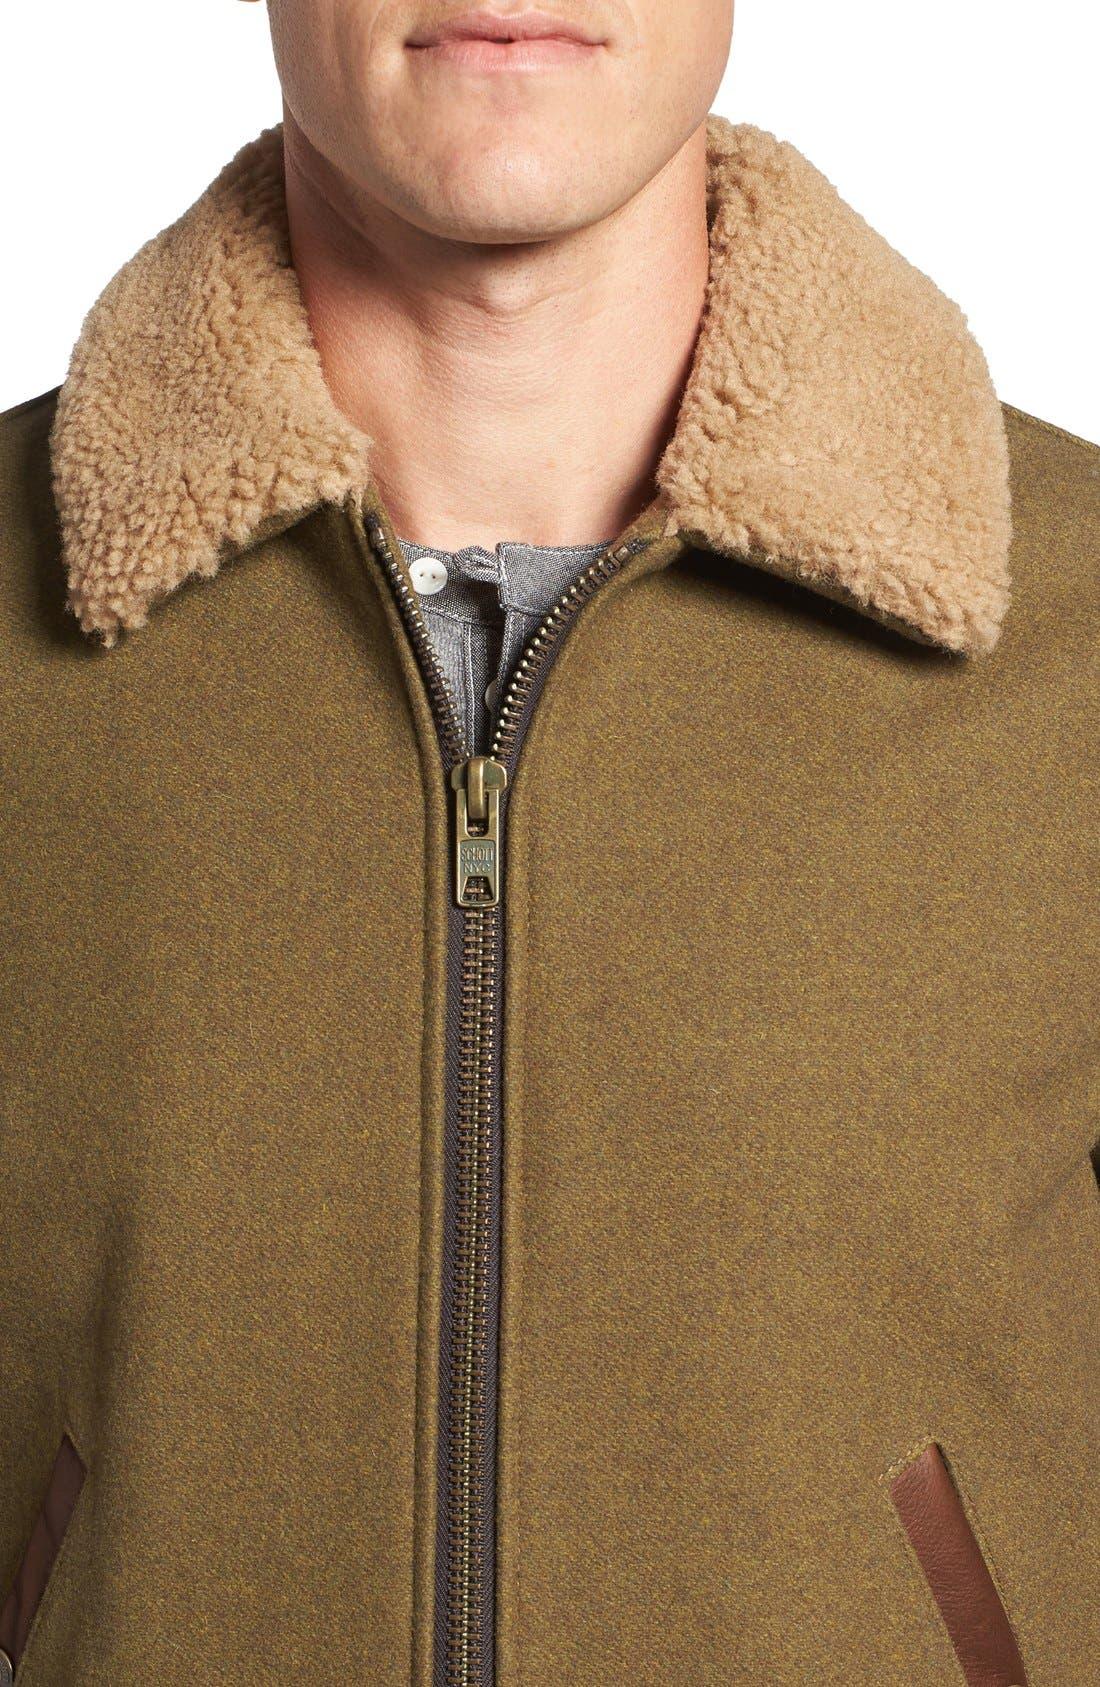 Mixed Media B-15 Flight Jacket with Genuine Shearling Collar,                             Alternate thumbnail 5, color,